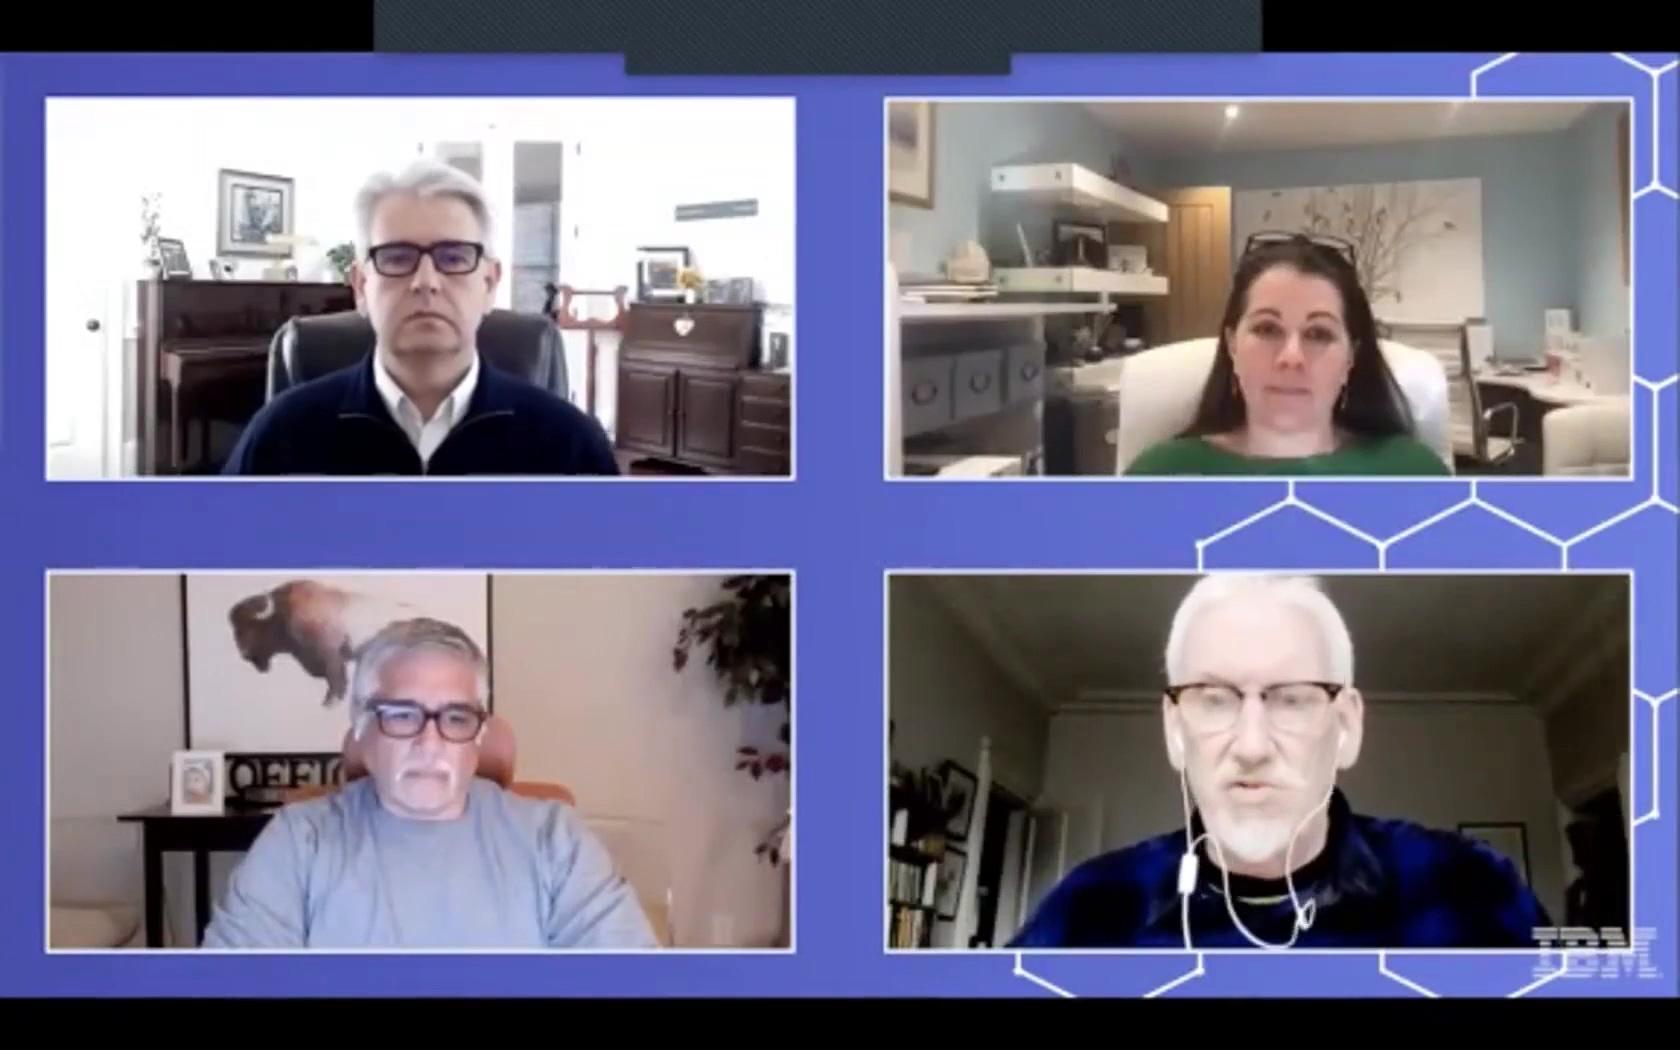 IBM Webinar 3 - The Future of Resiliency